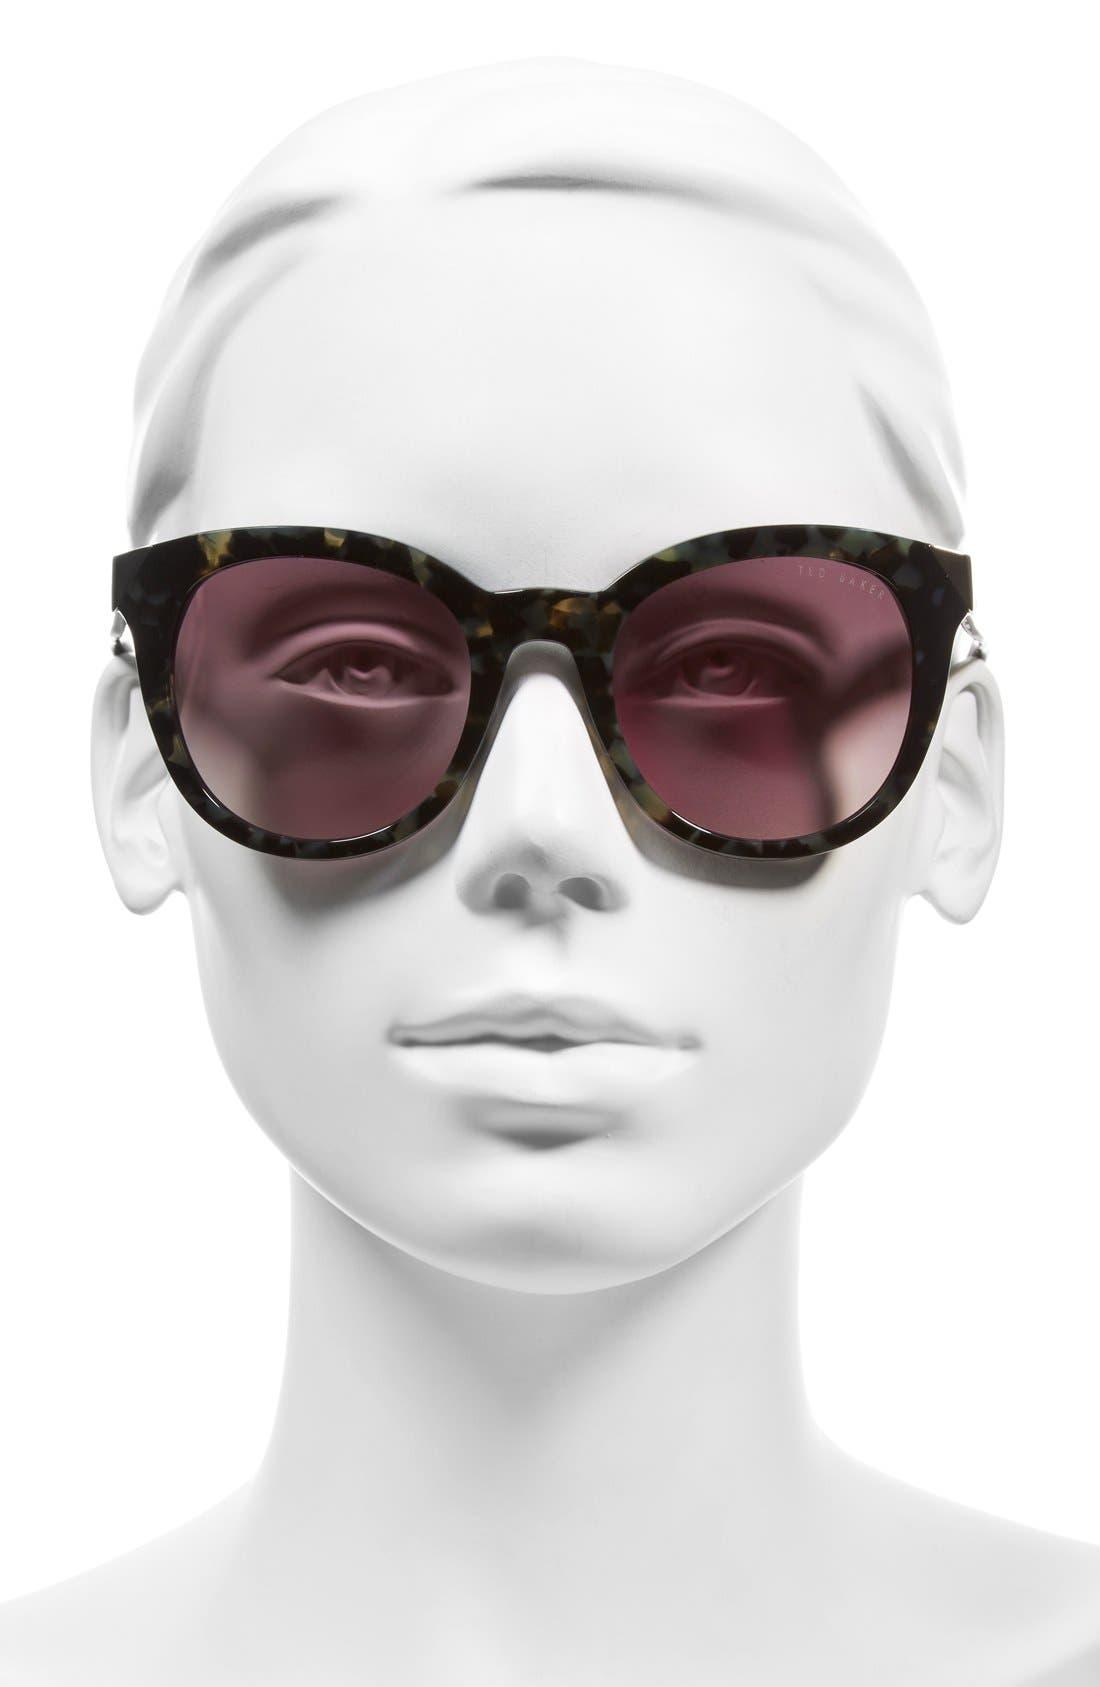 52mm Metal Accent Sunglasses,                             Alternate thumbnail 4, color,